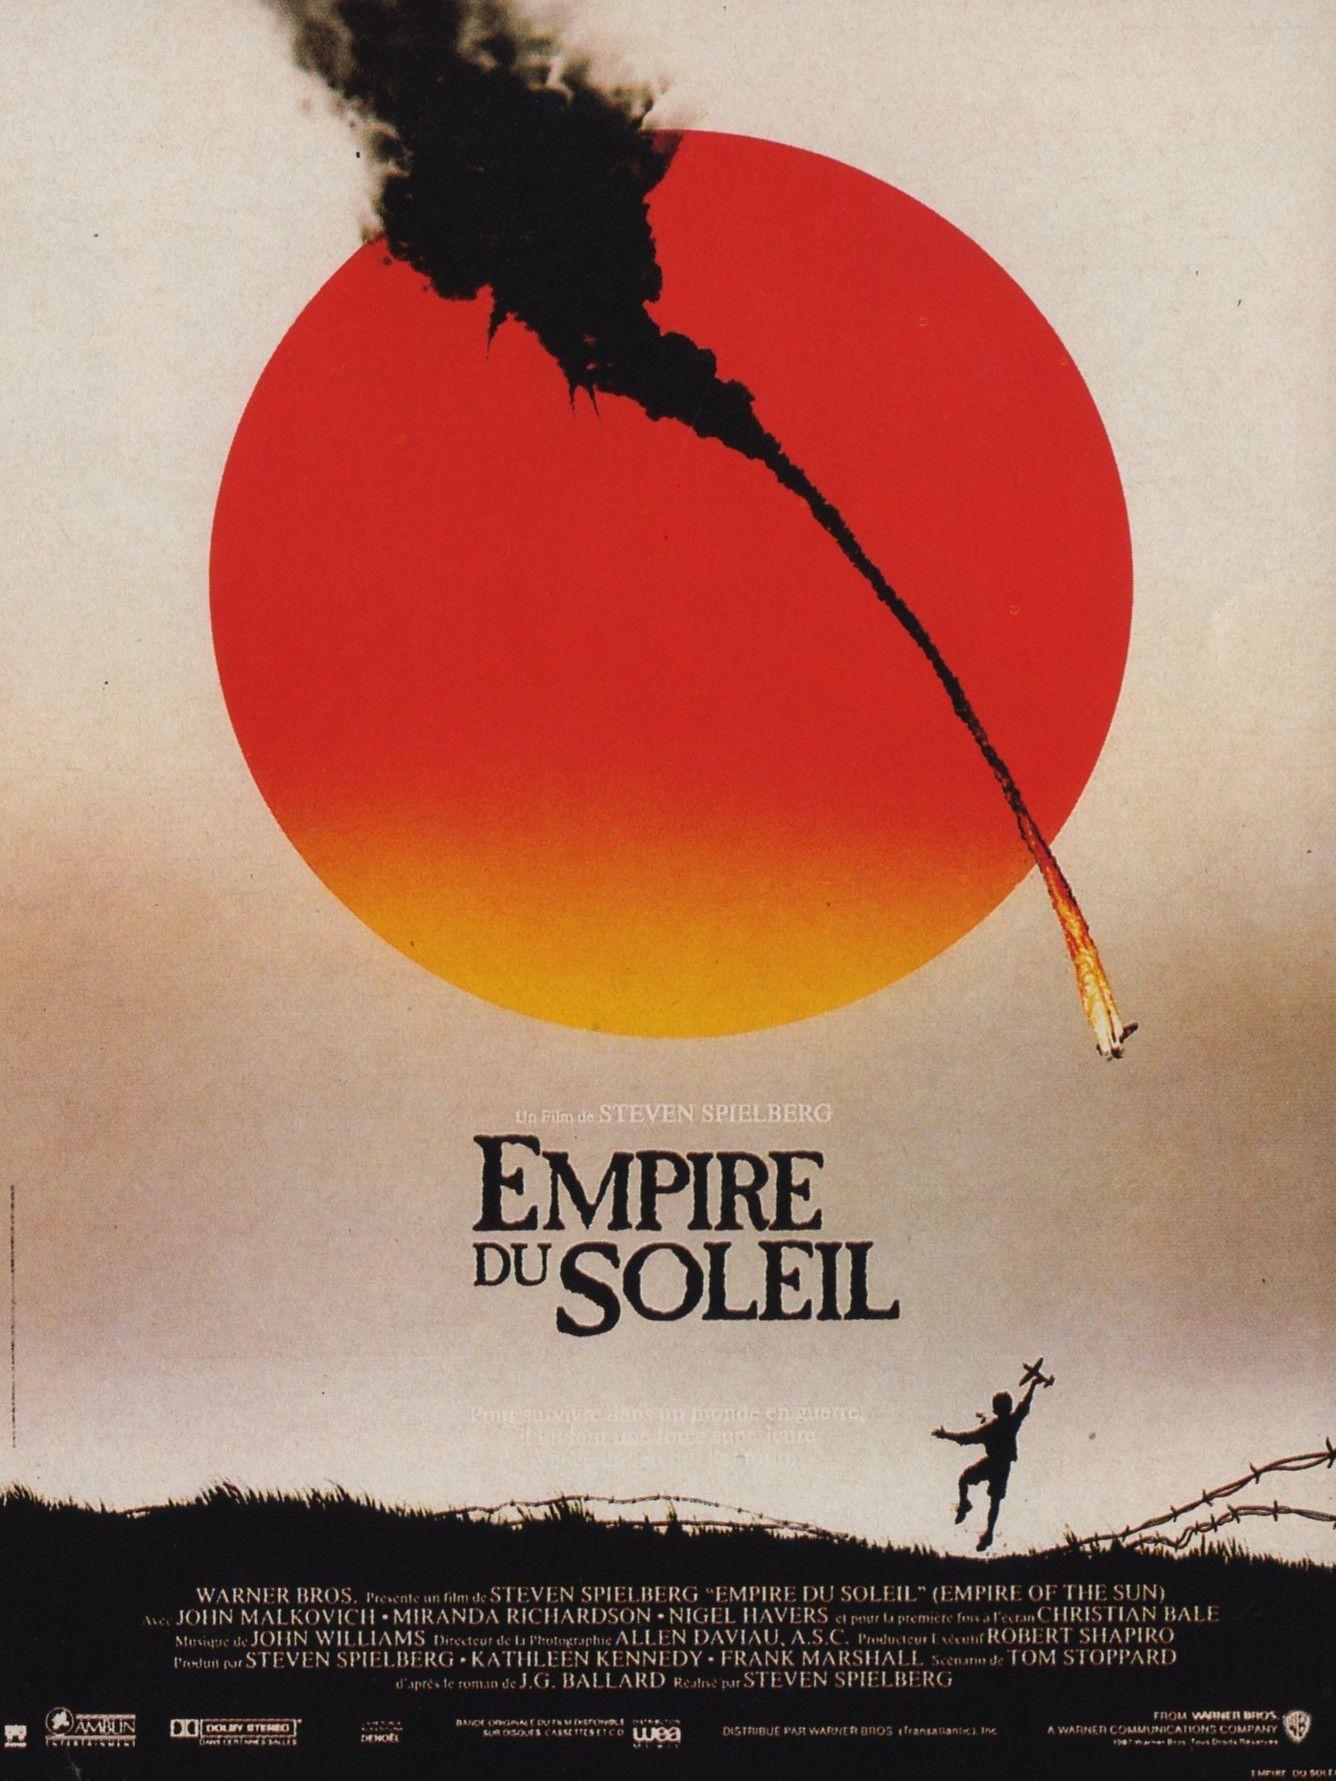 Empire_du_soleil.jpg